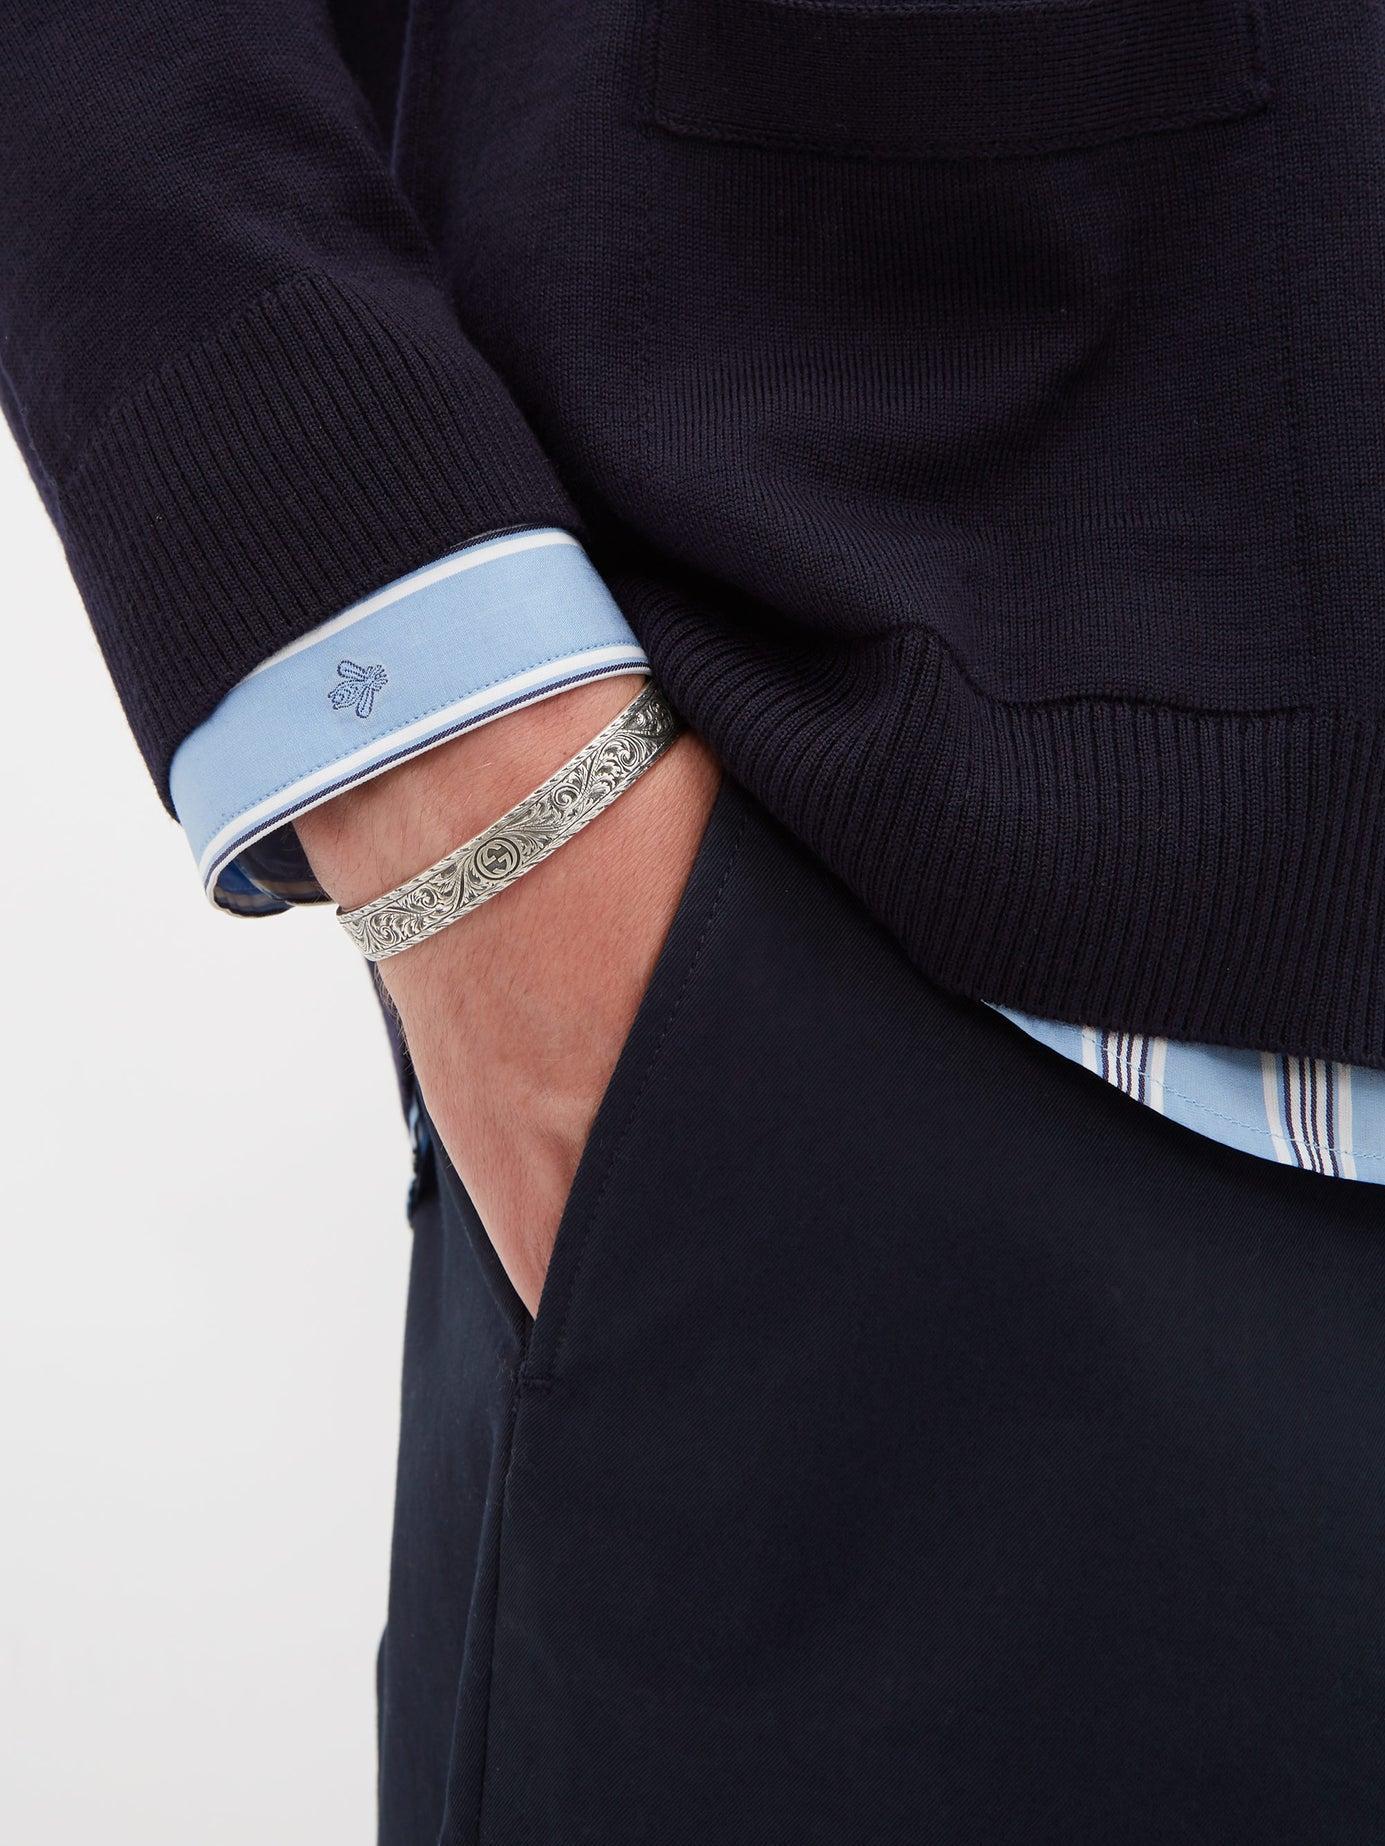 6473cc655 Gucci Tiger Head Sterling Silver Cuff Bracelet in Metallic for Men - Lyst